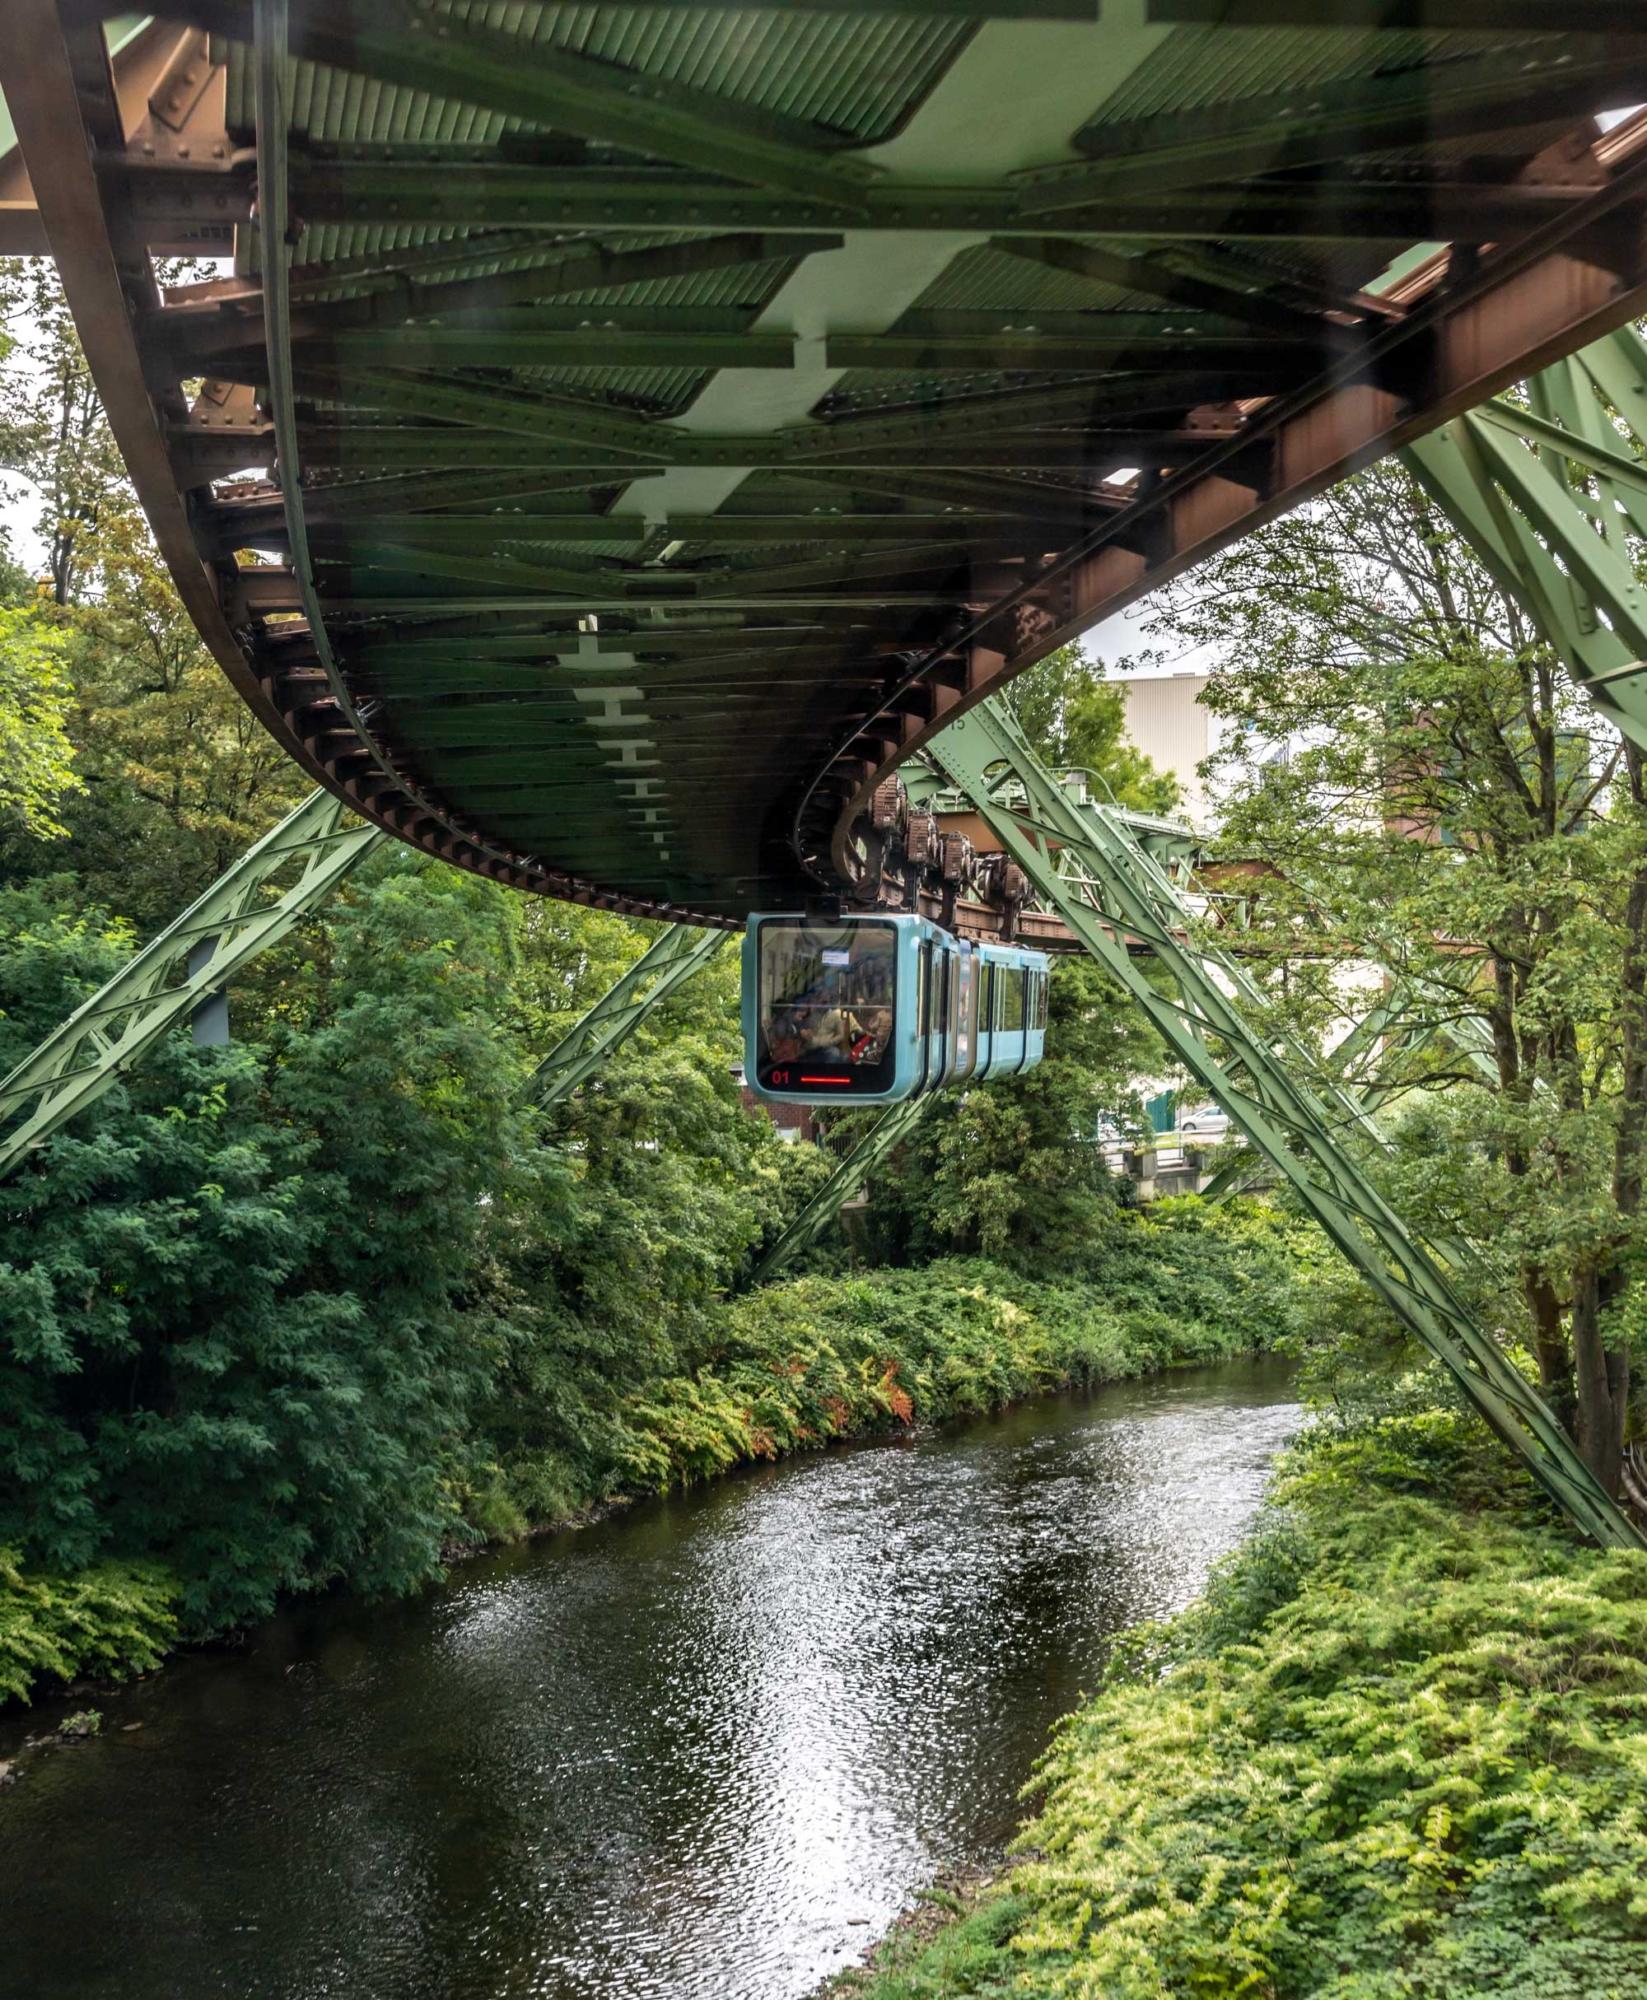 Wuppertal Schwebebahn Monorail, Germany 190905wc859592